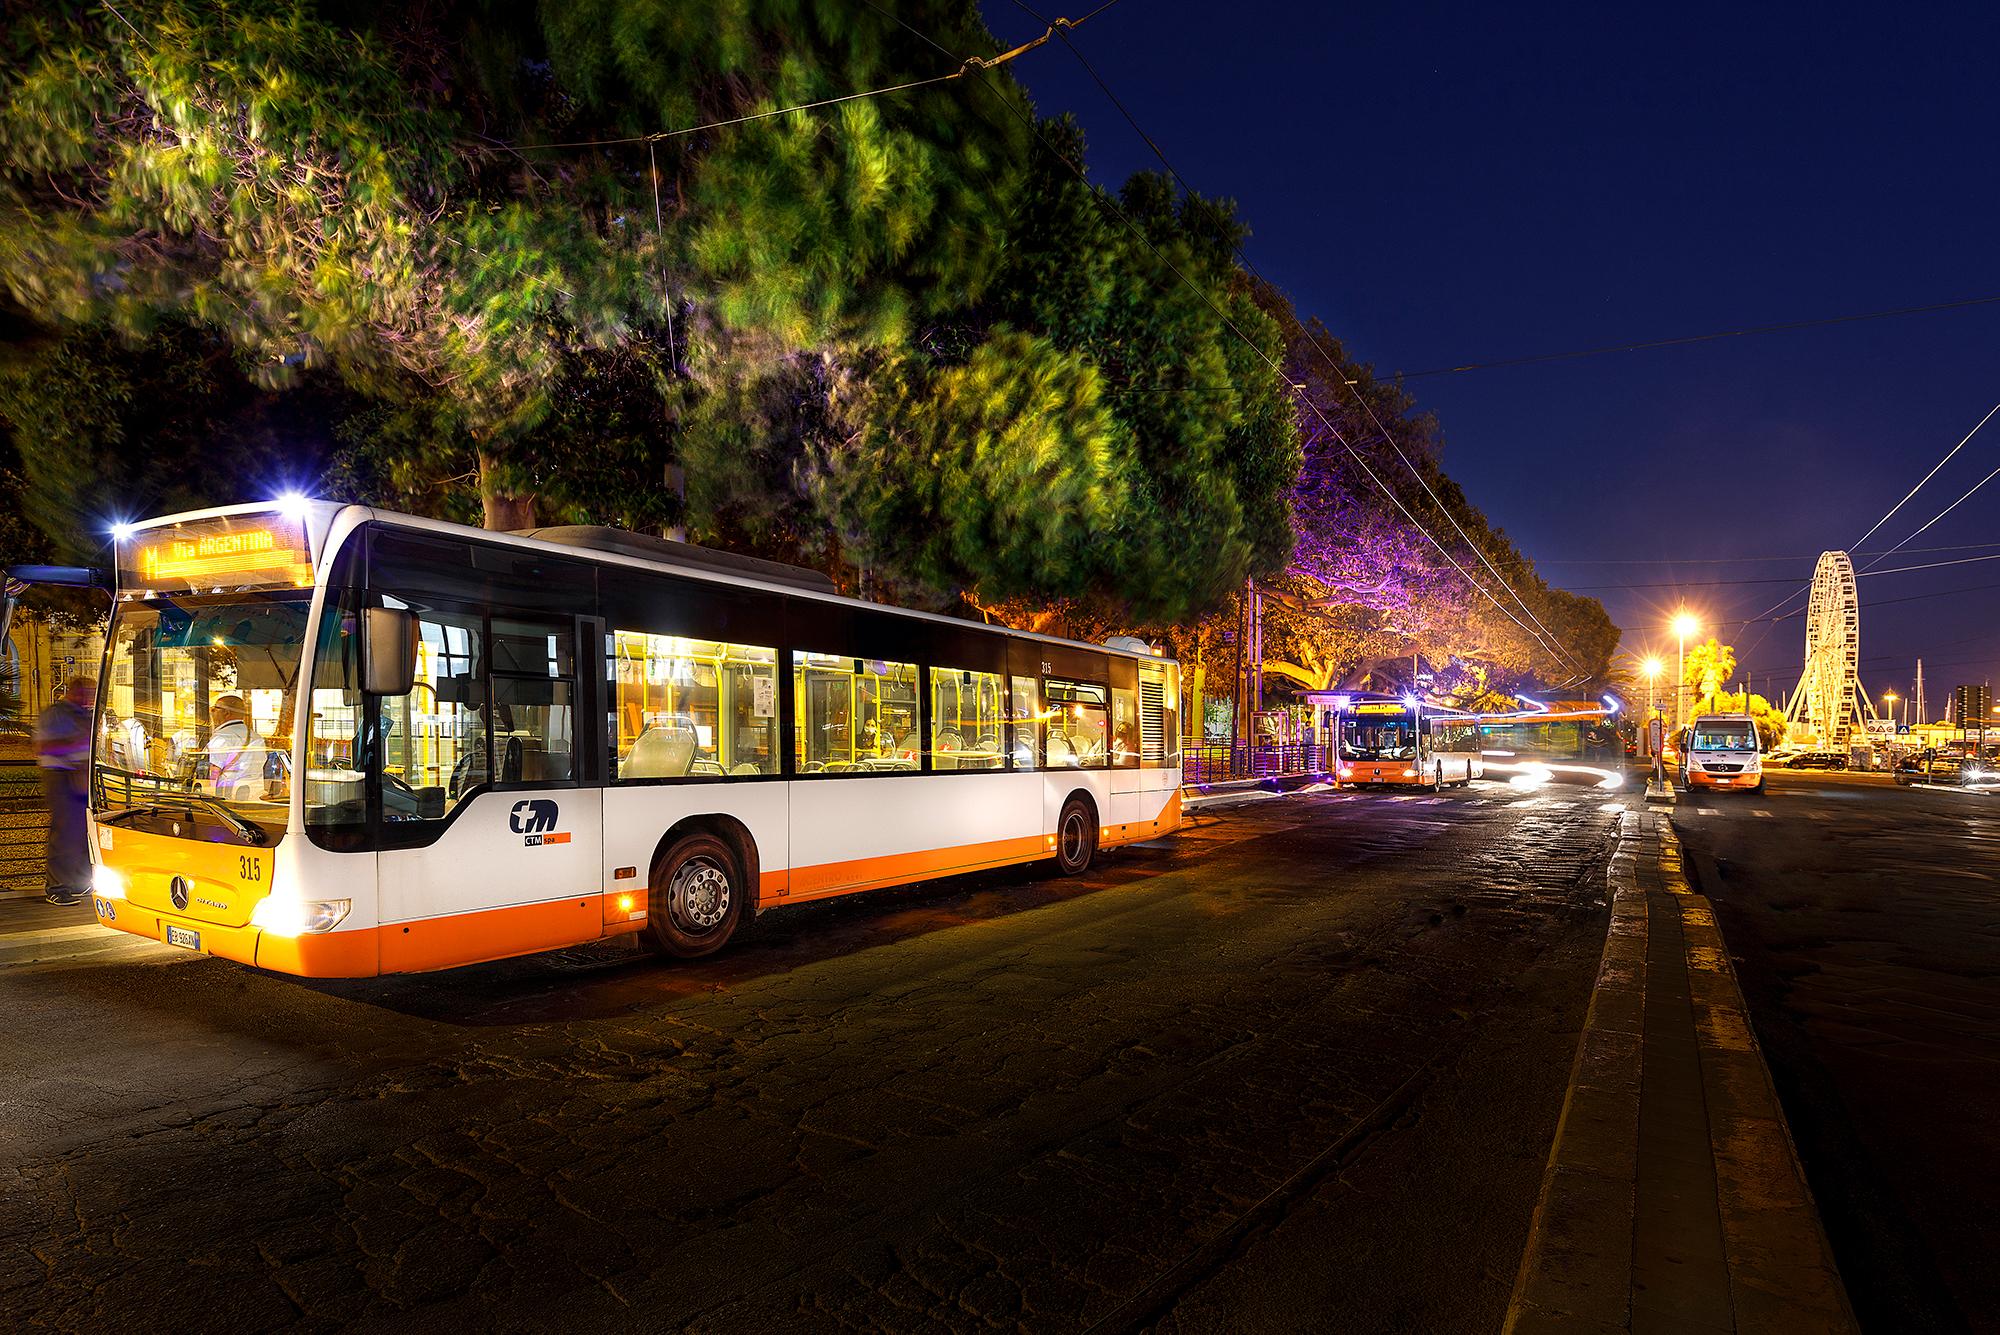 bus linee notturne via Roma s